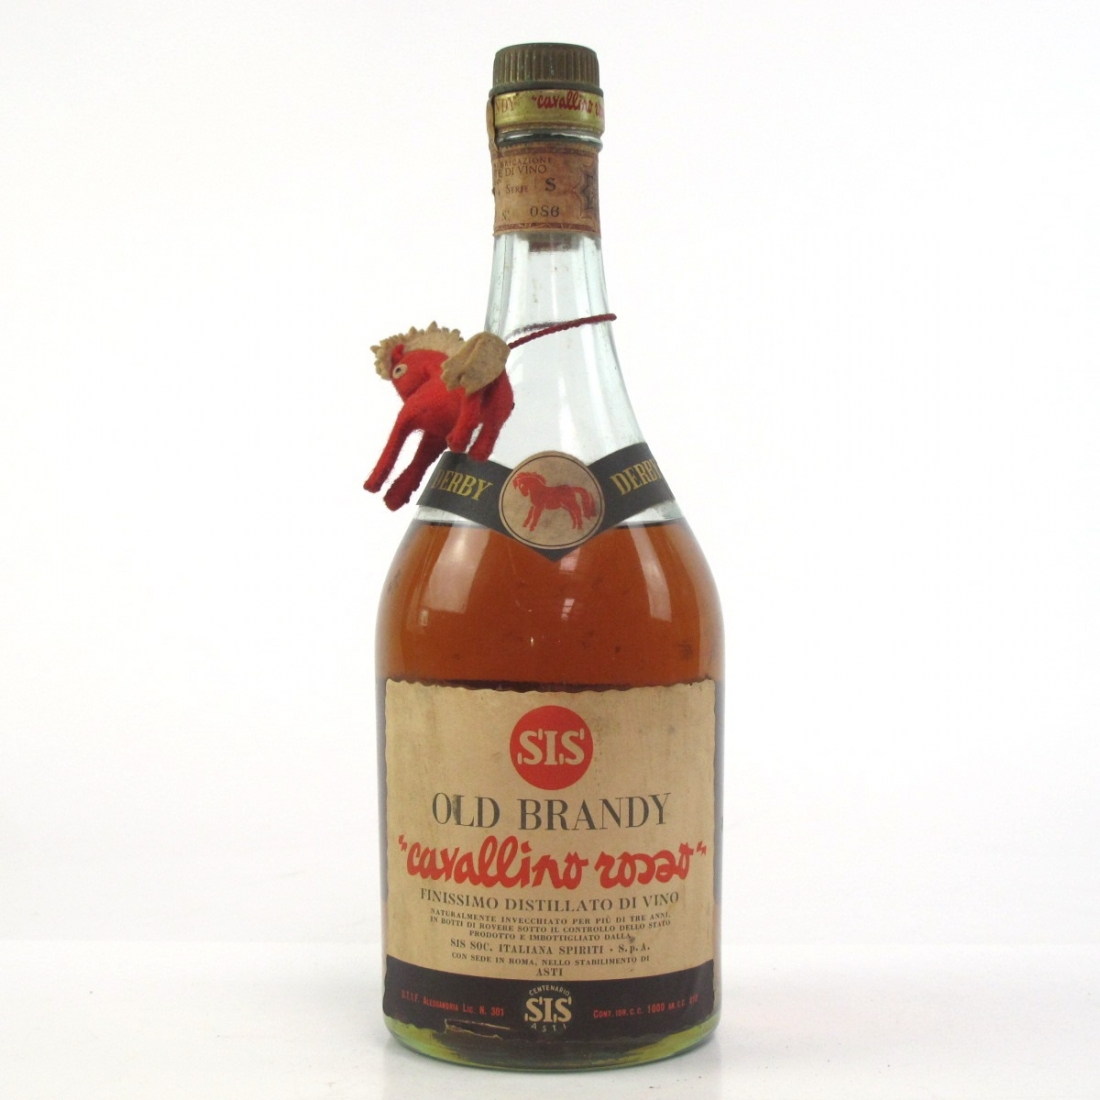 Sis Old Brandy 1 Litre